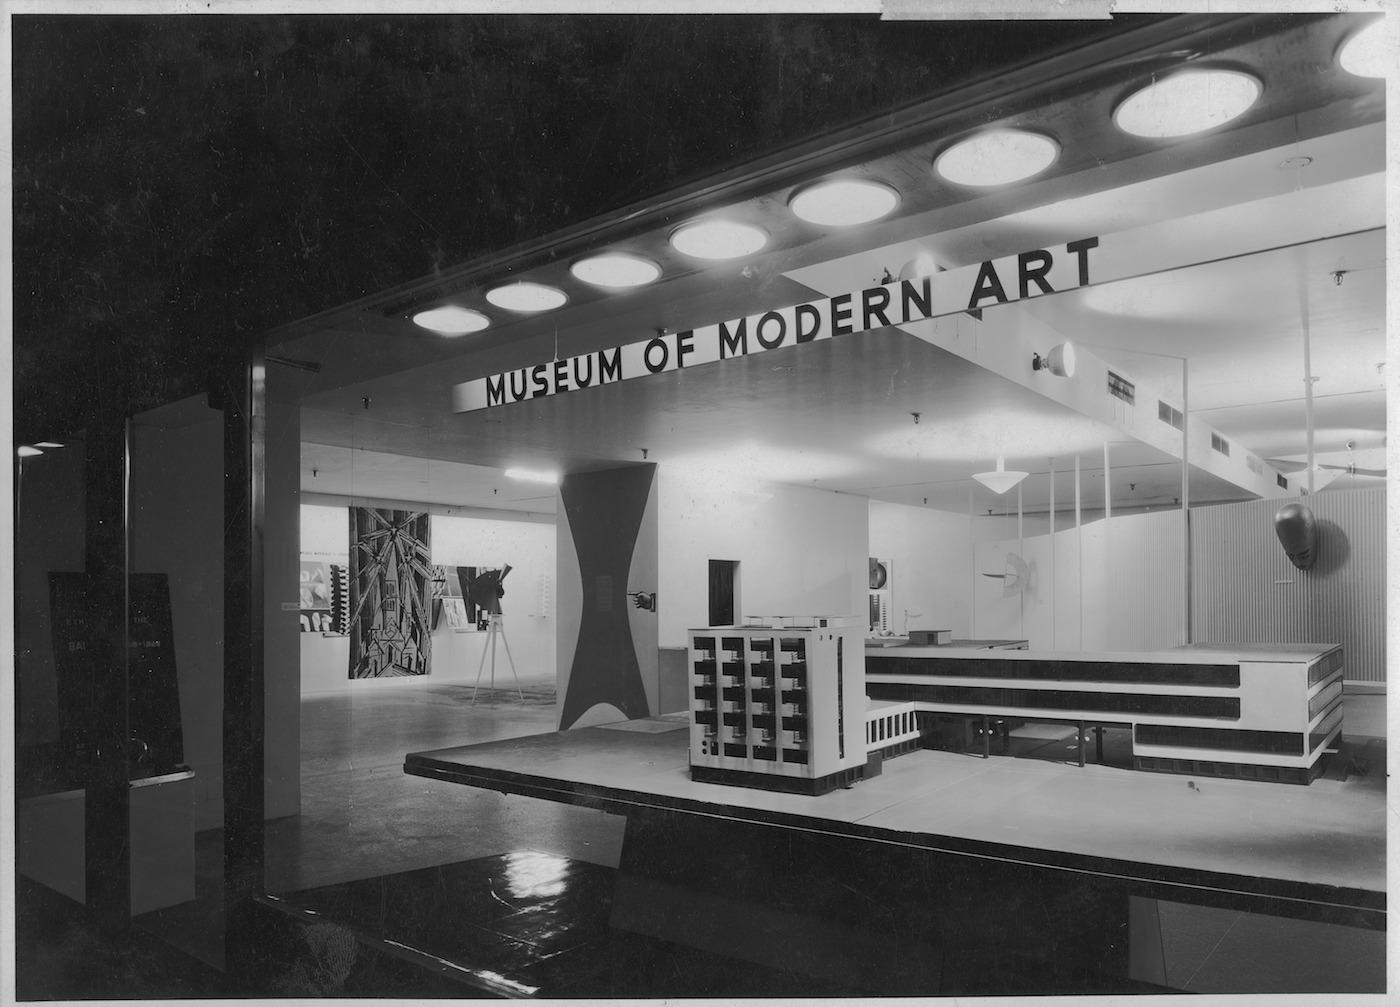 IN82 Bauhaus: 1919-1928, December 7, 1938 - January 30, 1939